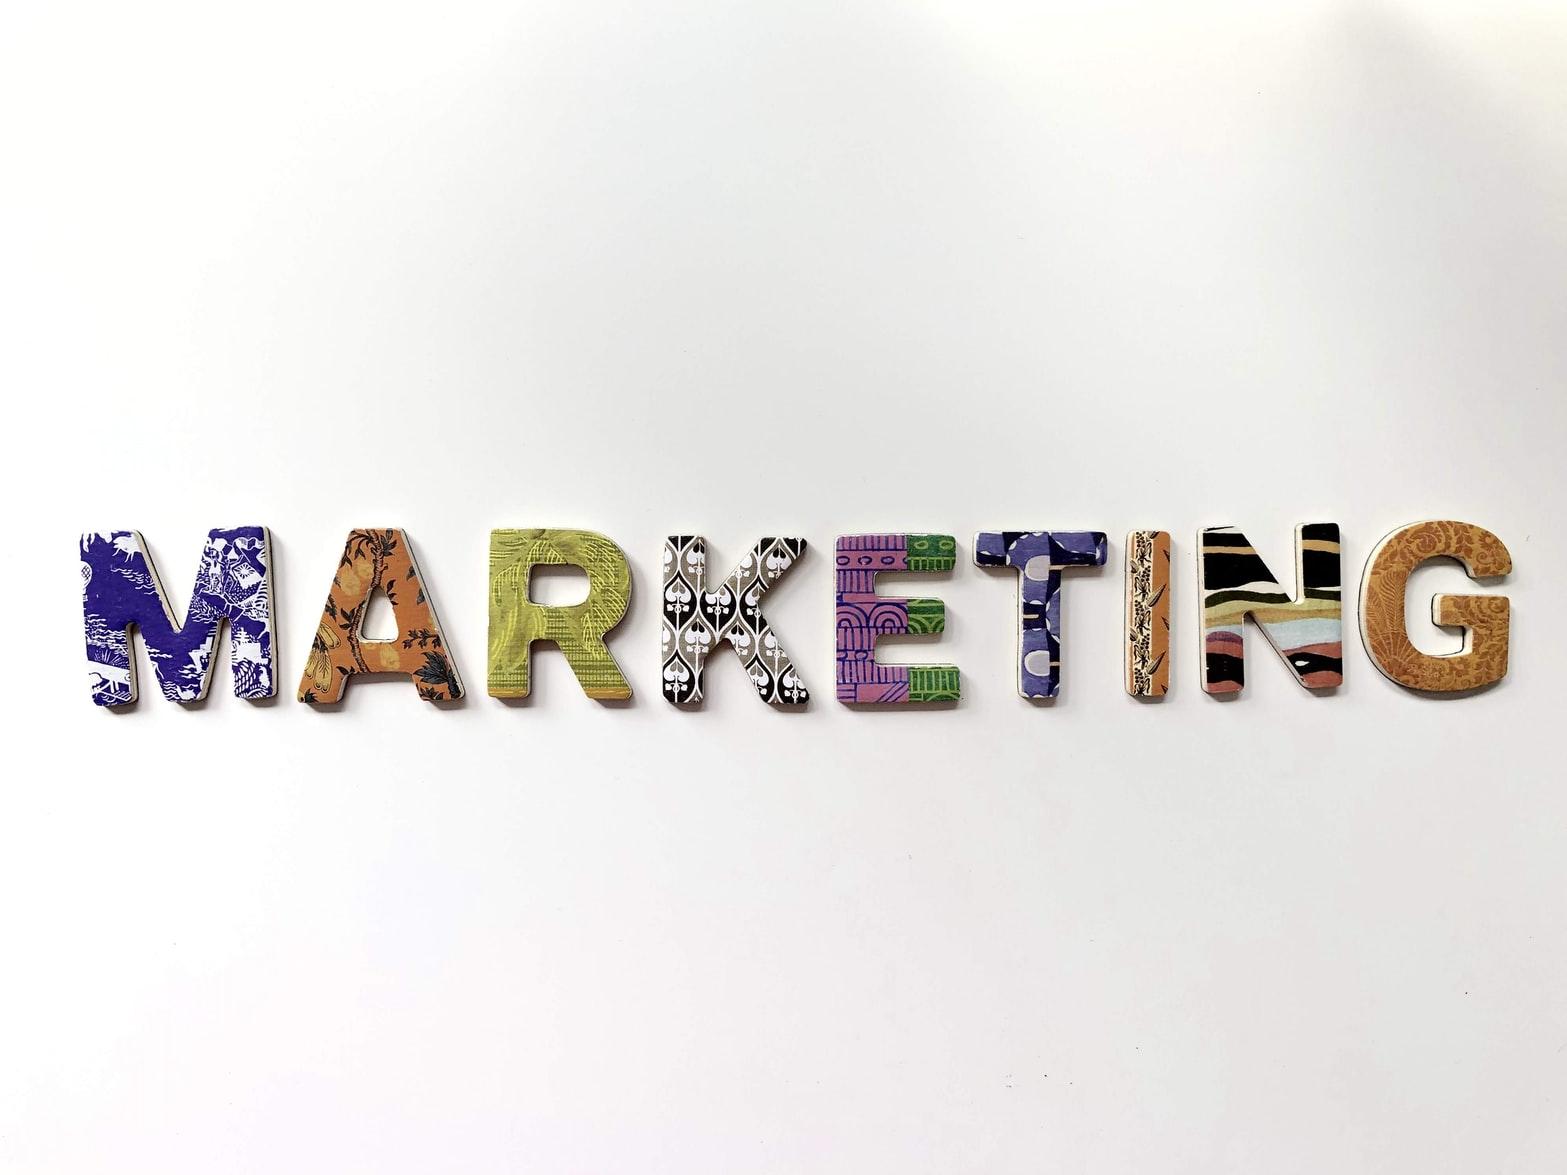 Digital marketing services in Atlanta